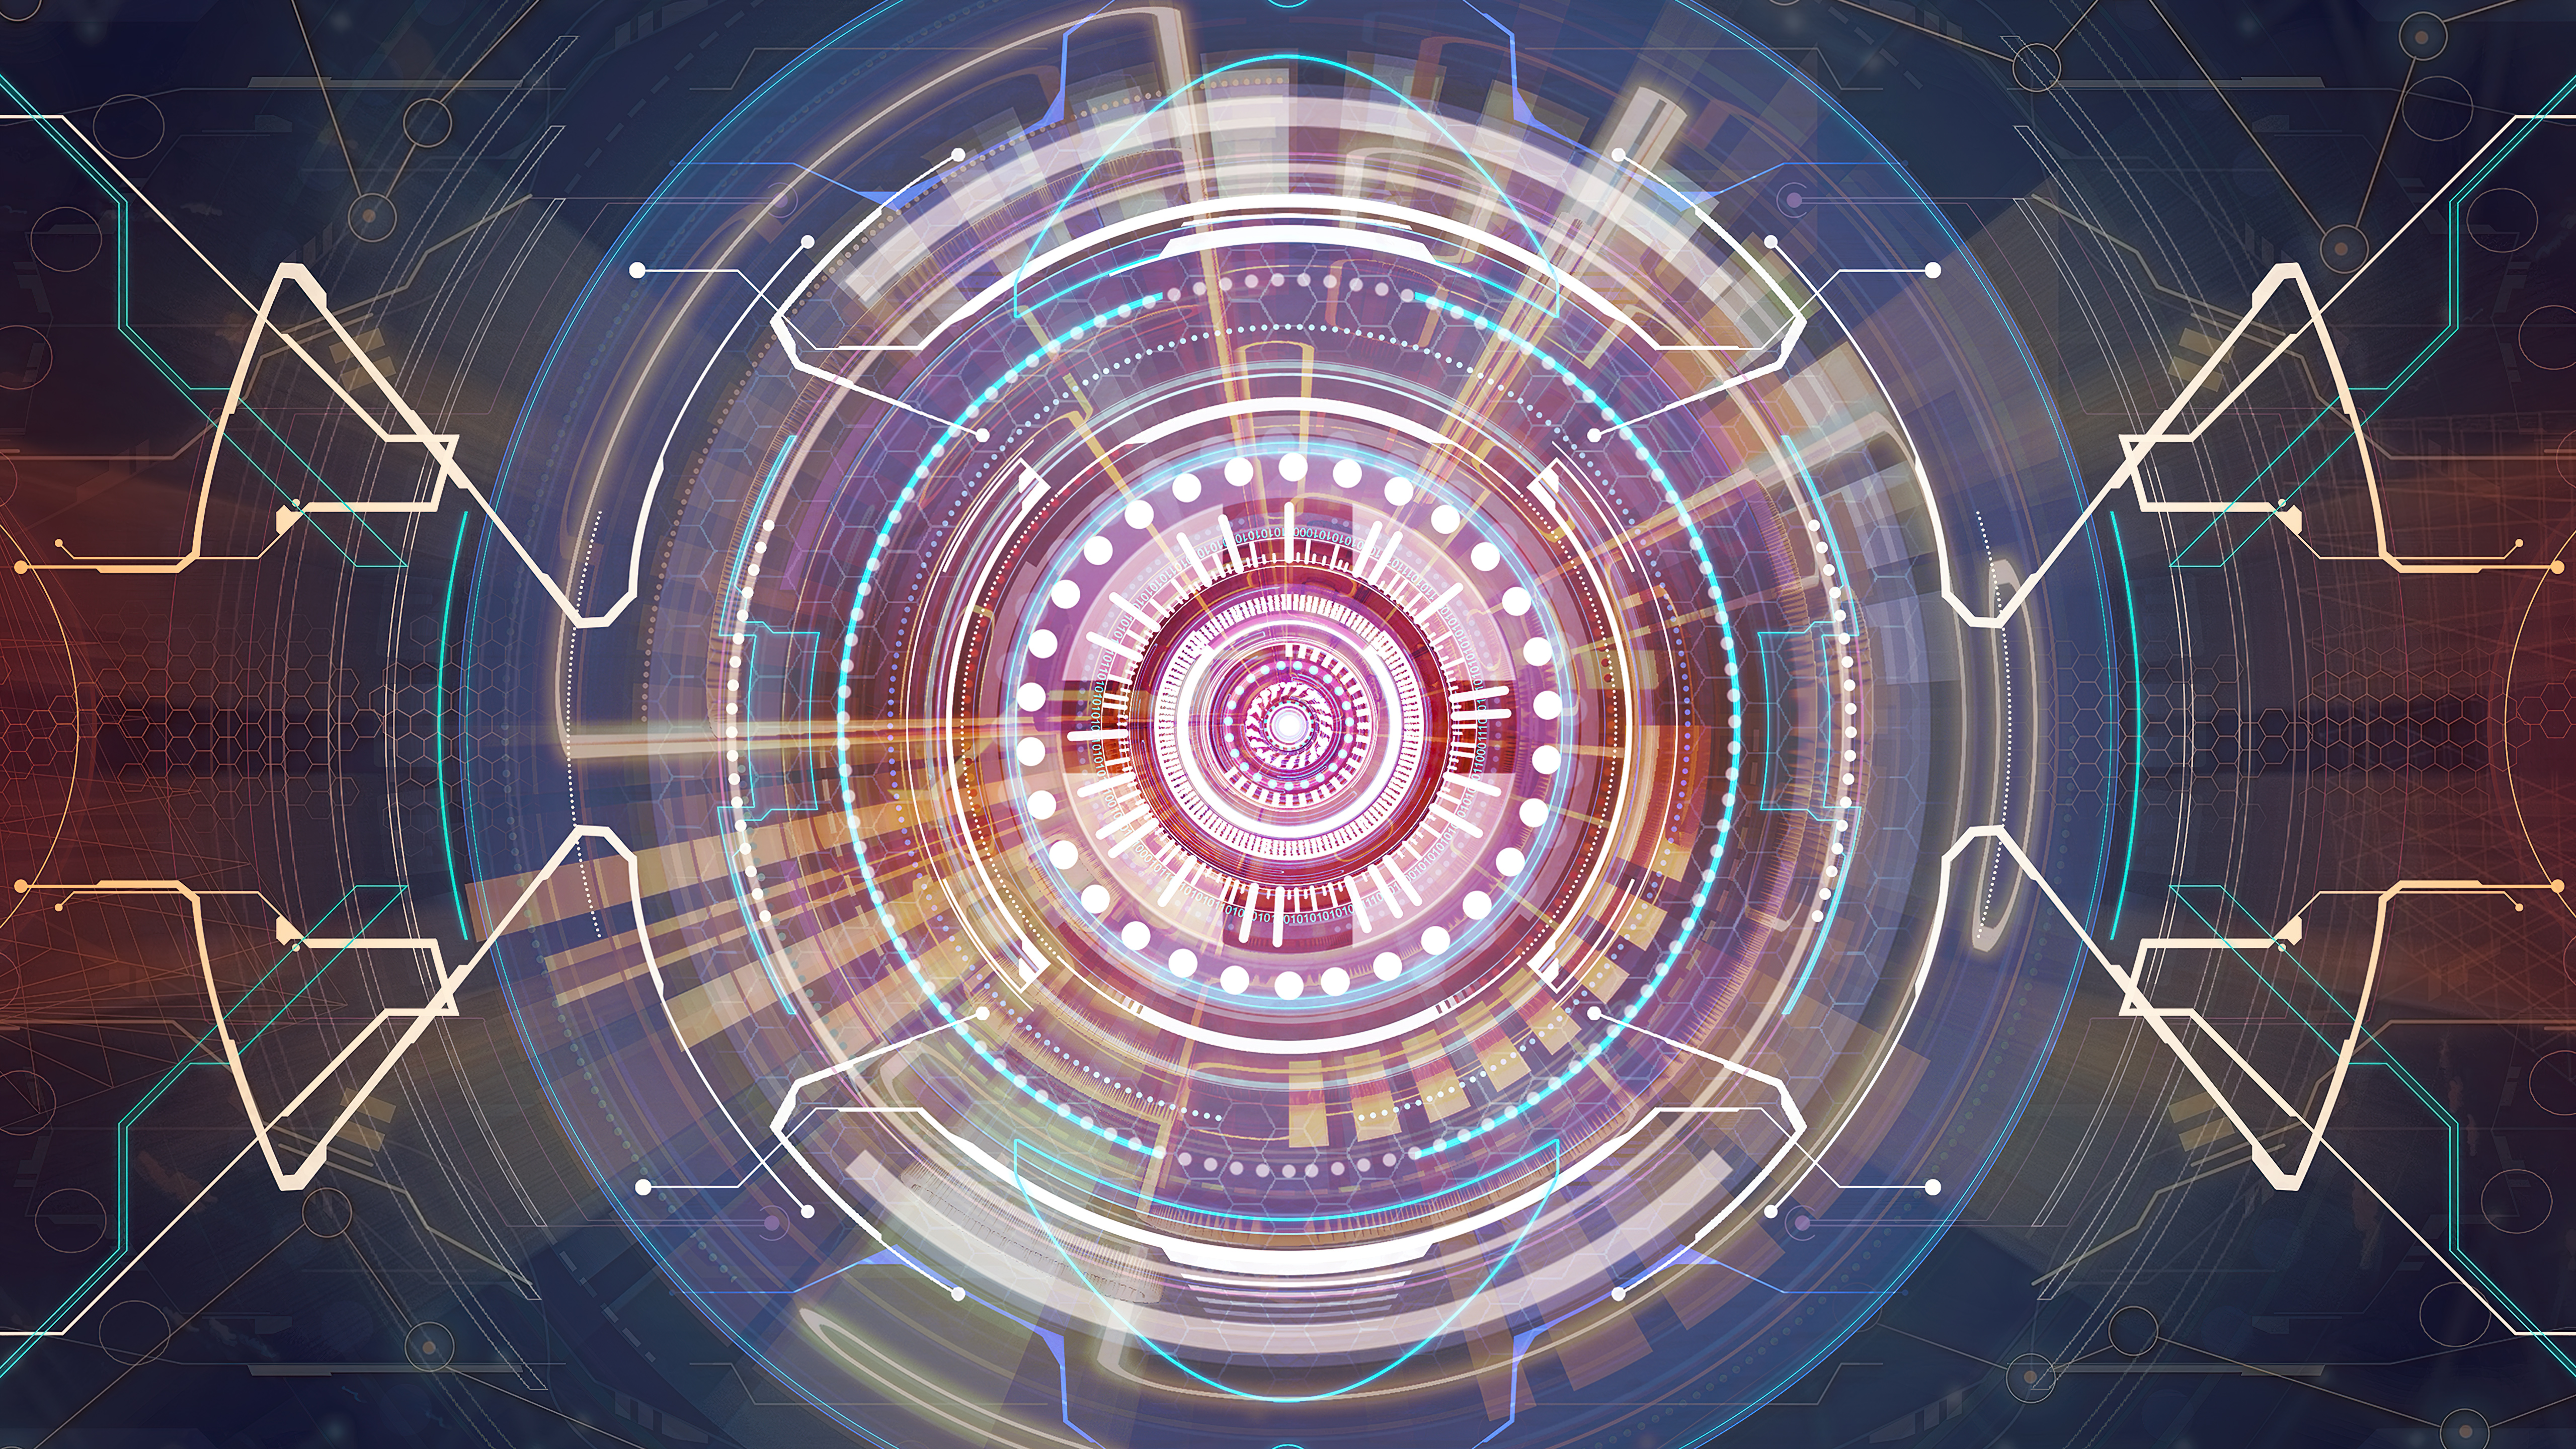 macro core tech 4k 1634162647 - Macro Core Tech 4k - Macro Core Tech wallpapers, Macro Core Tech 4k wallpapers